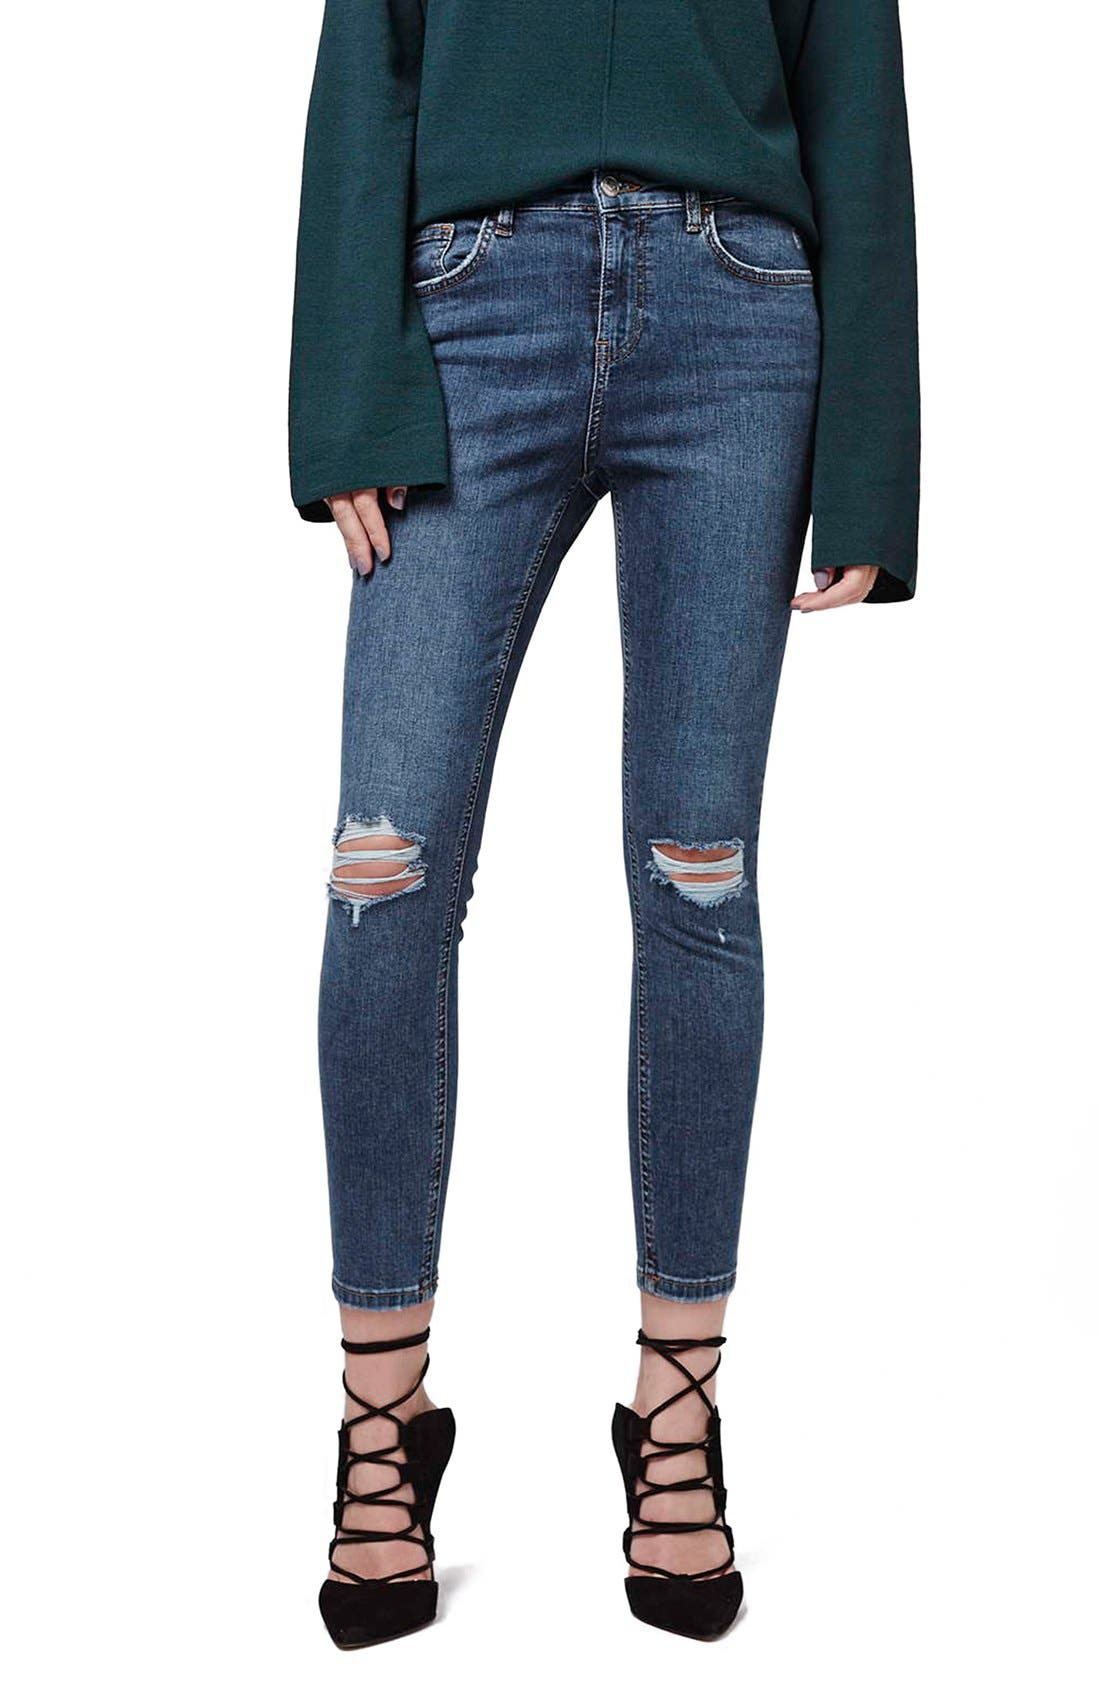 Main Image - Topshop Moto 'Jamie' Ripped Skinny Ankle Jeans (Petite)